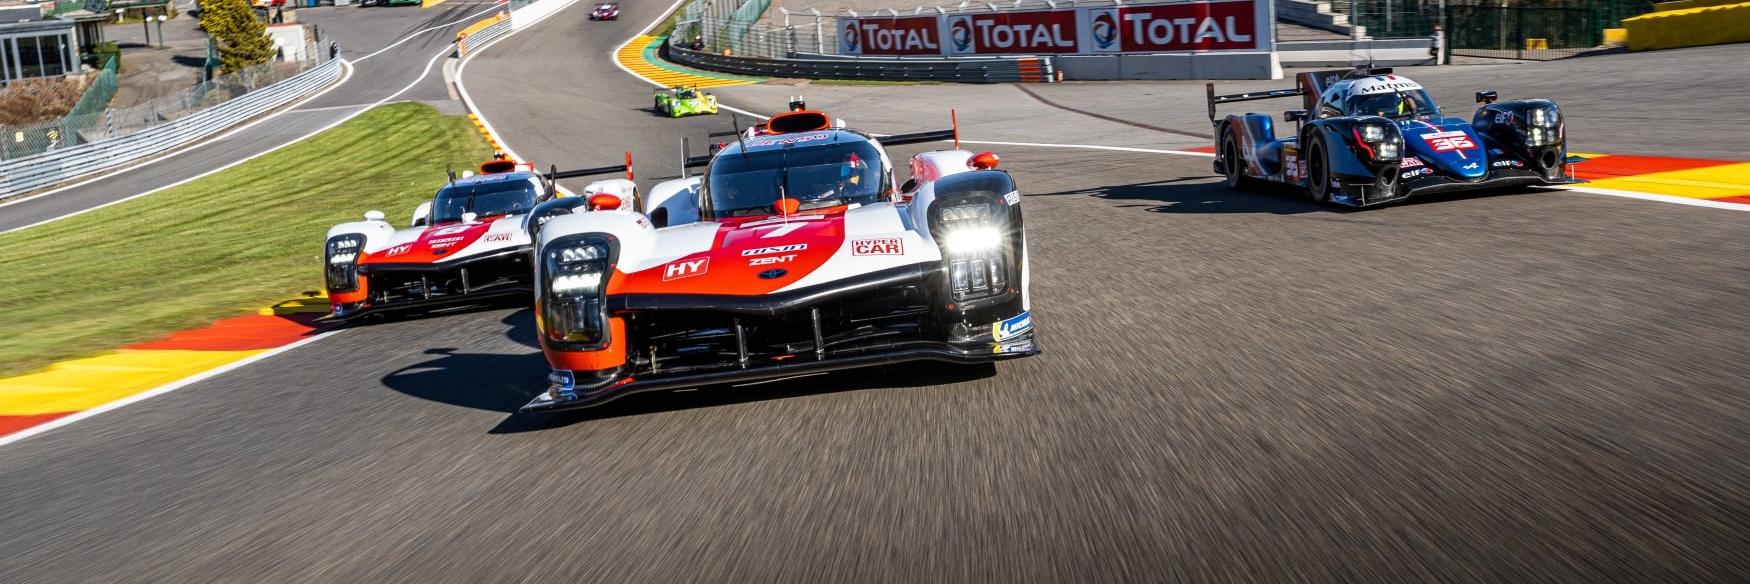 FIA WEC 6 Hours of Spa-Francorchamps slide 1